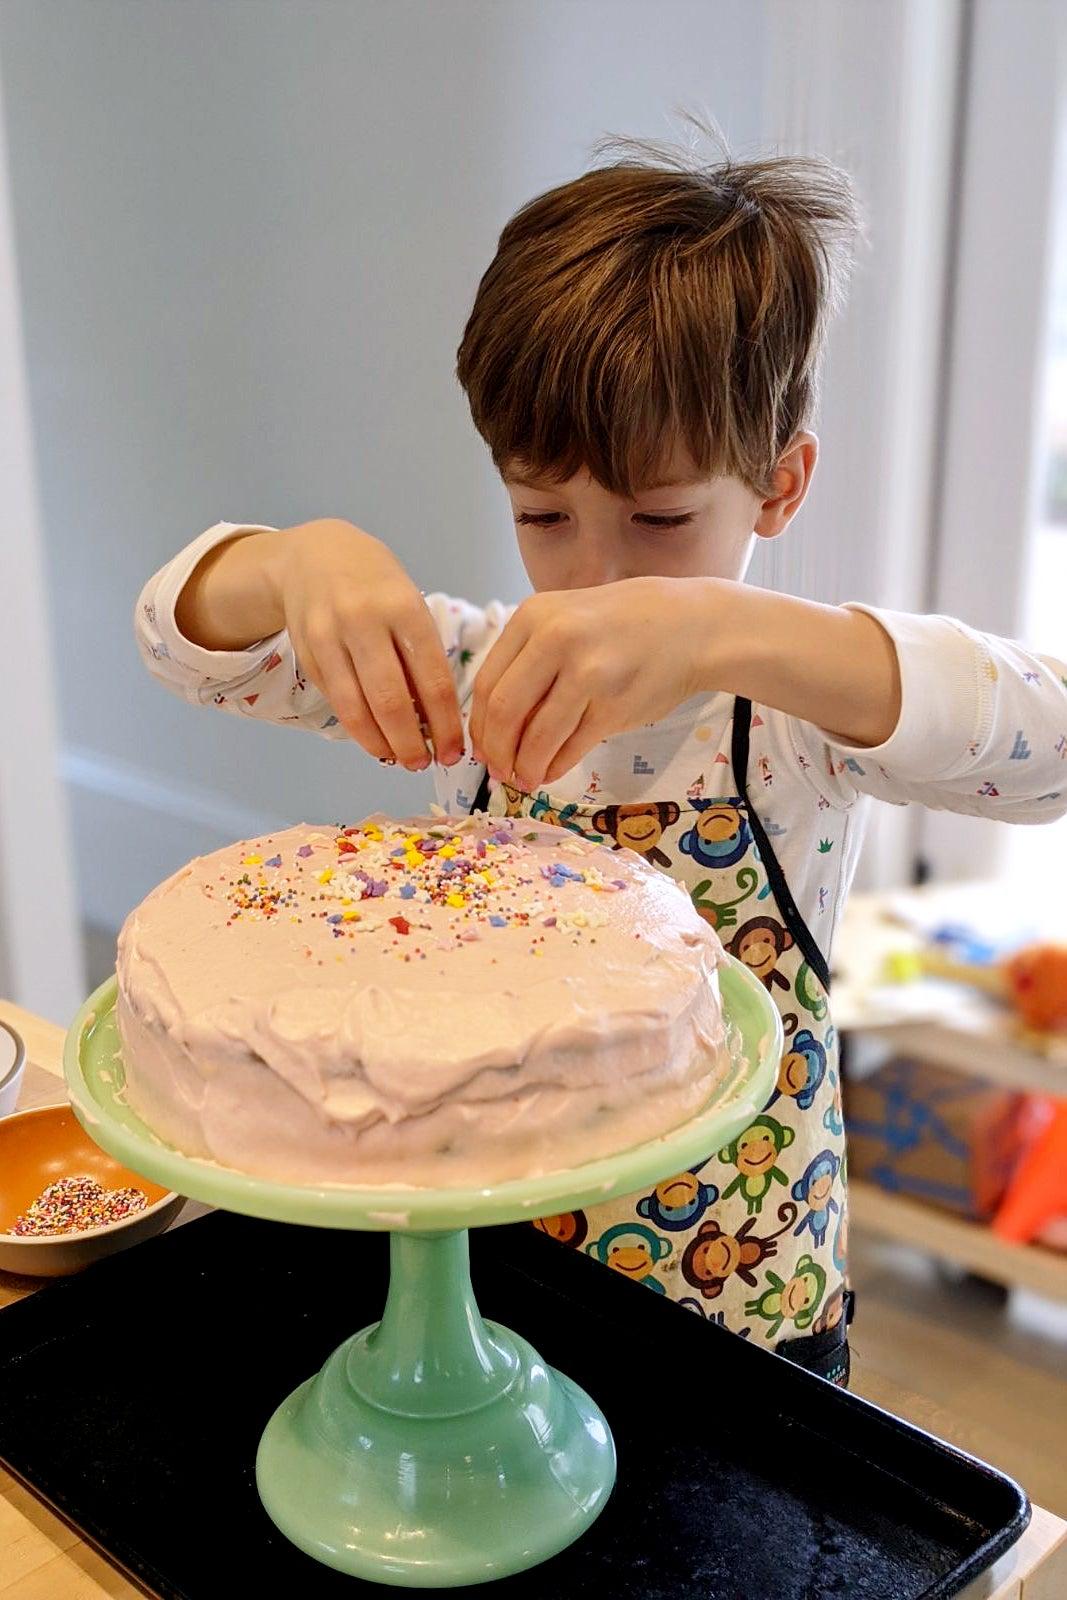 boycotting sprinkles on a cake